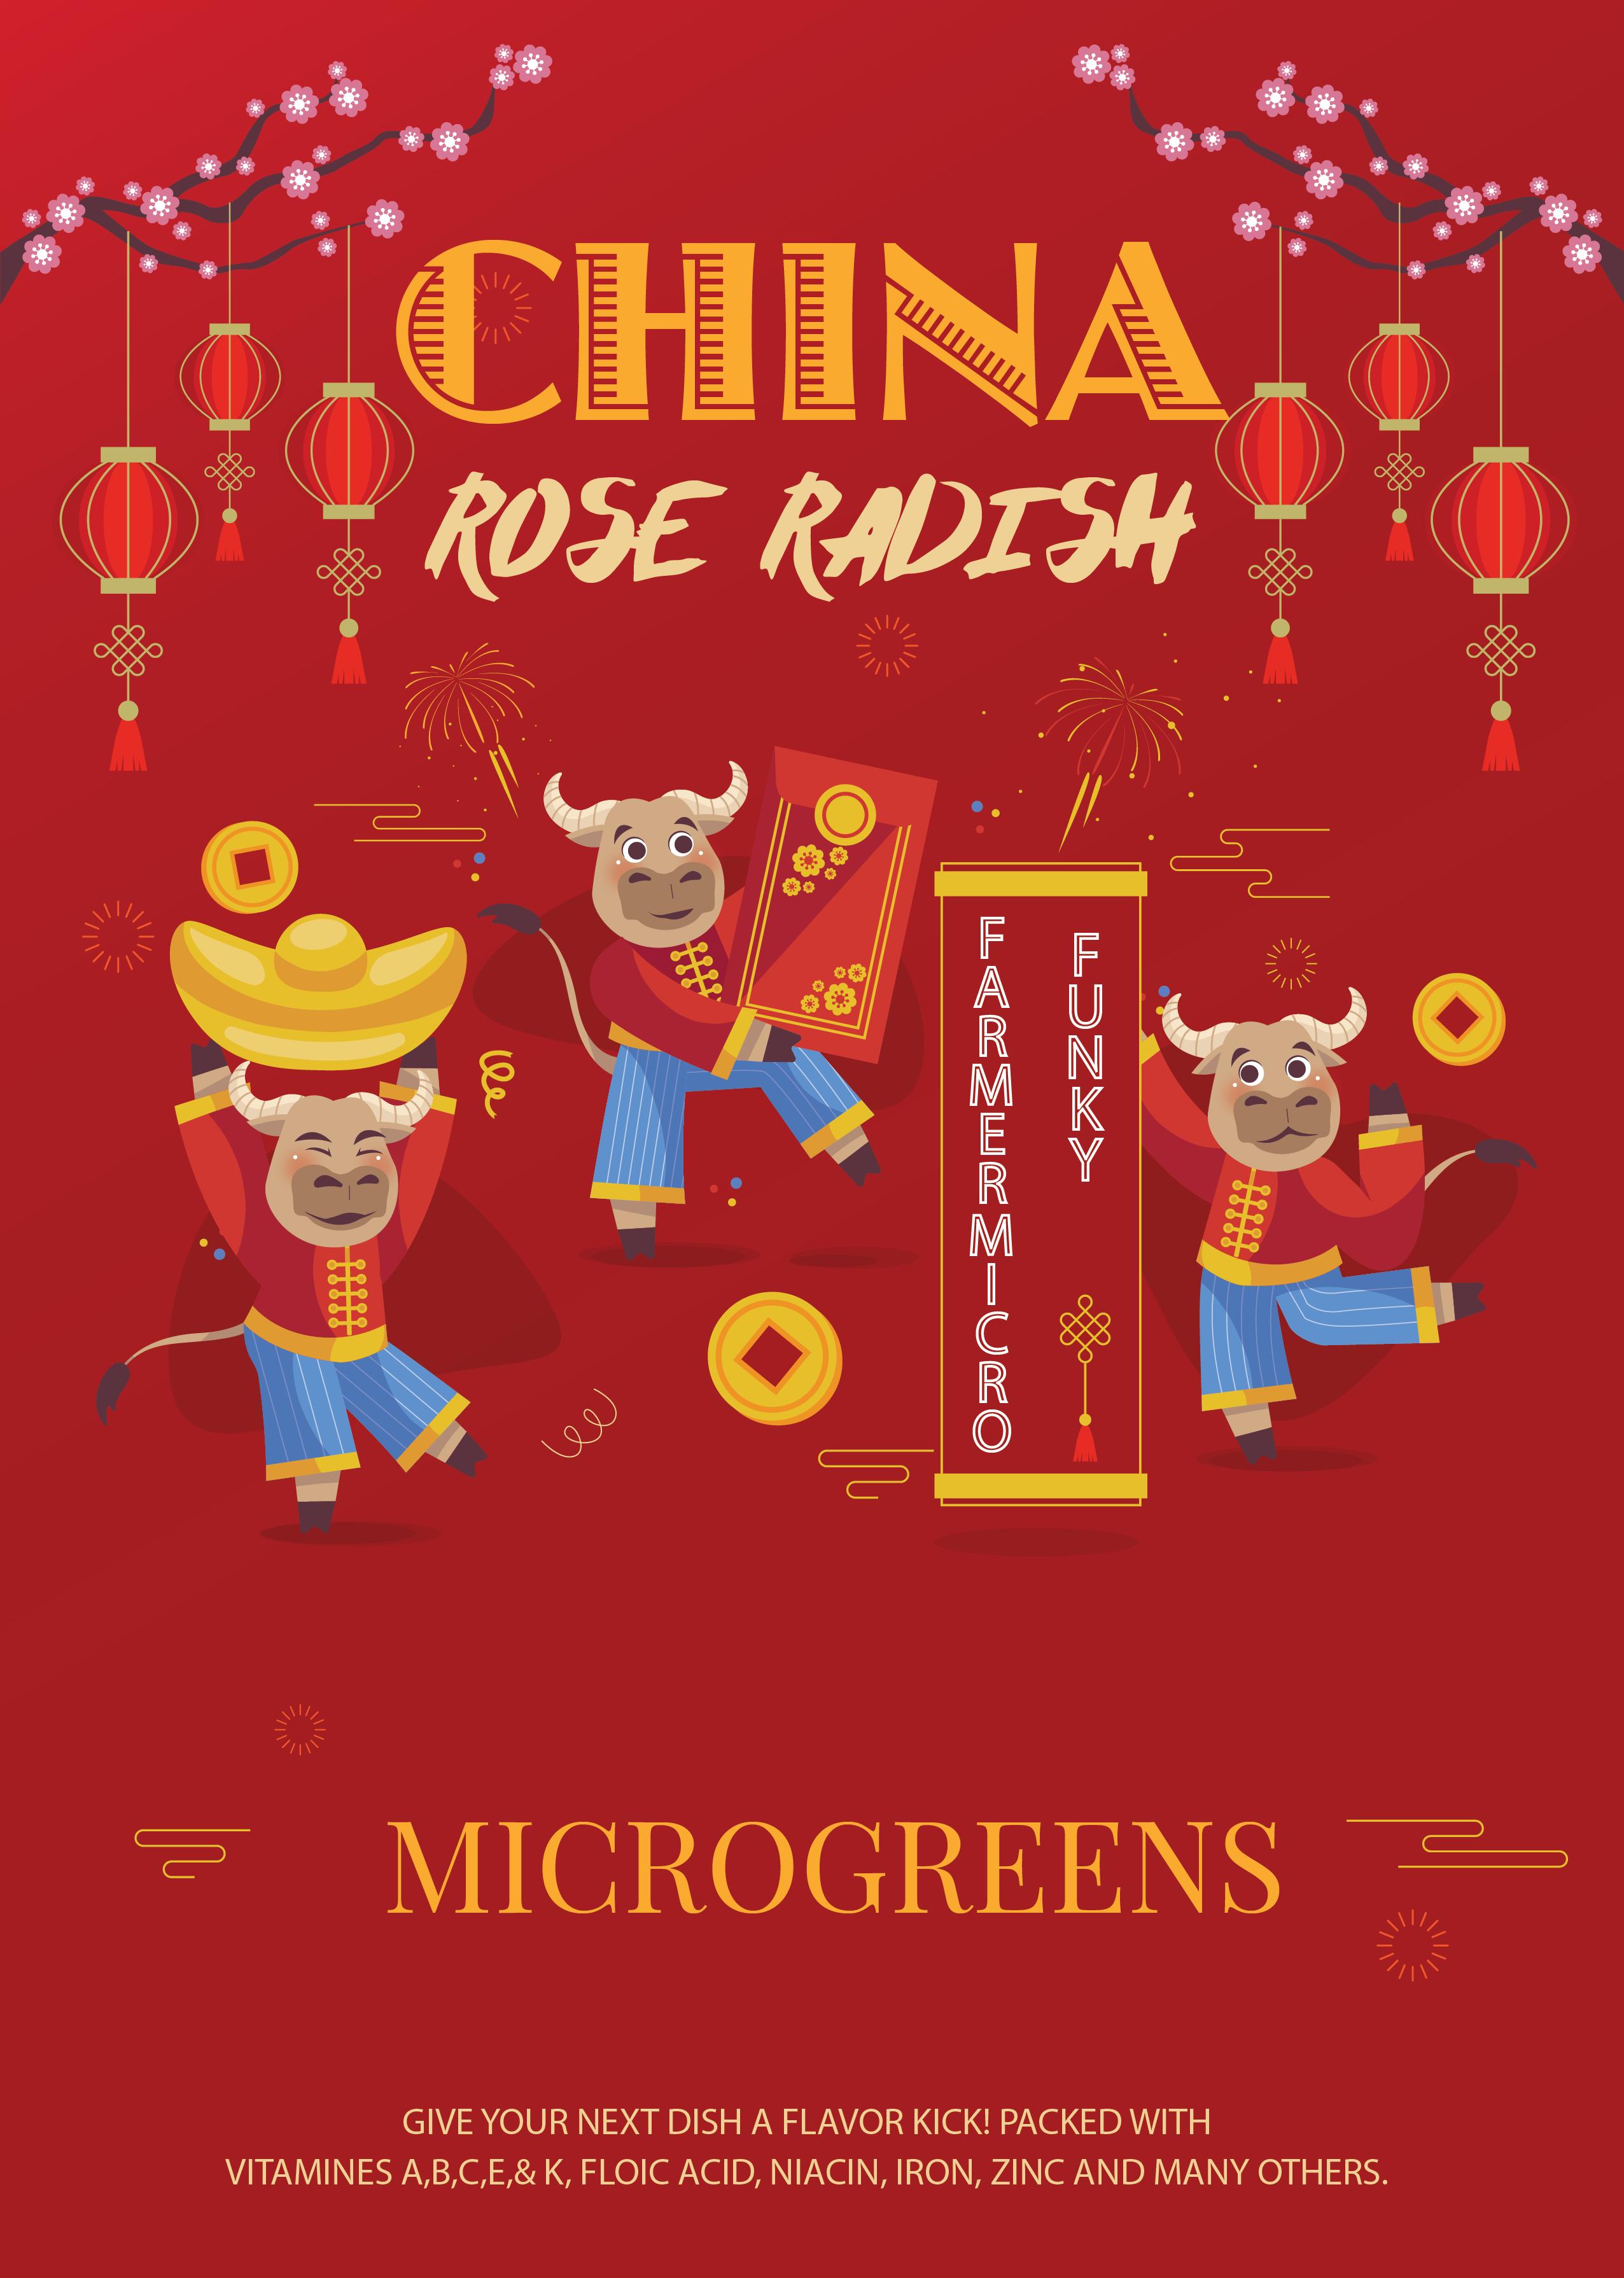 China Rose Radish